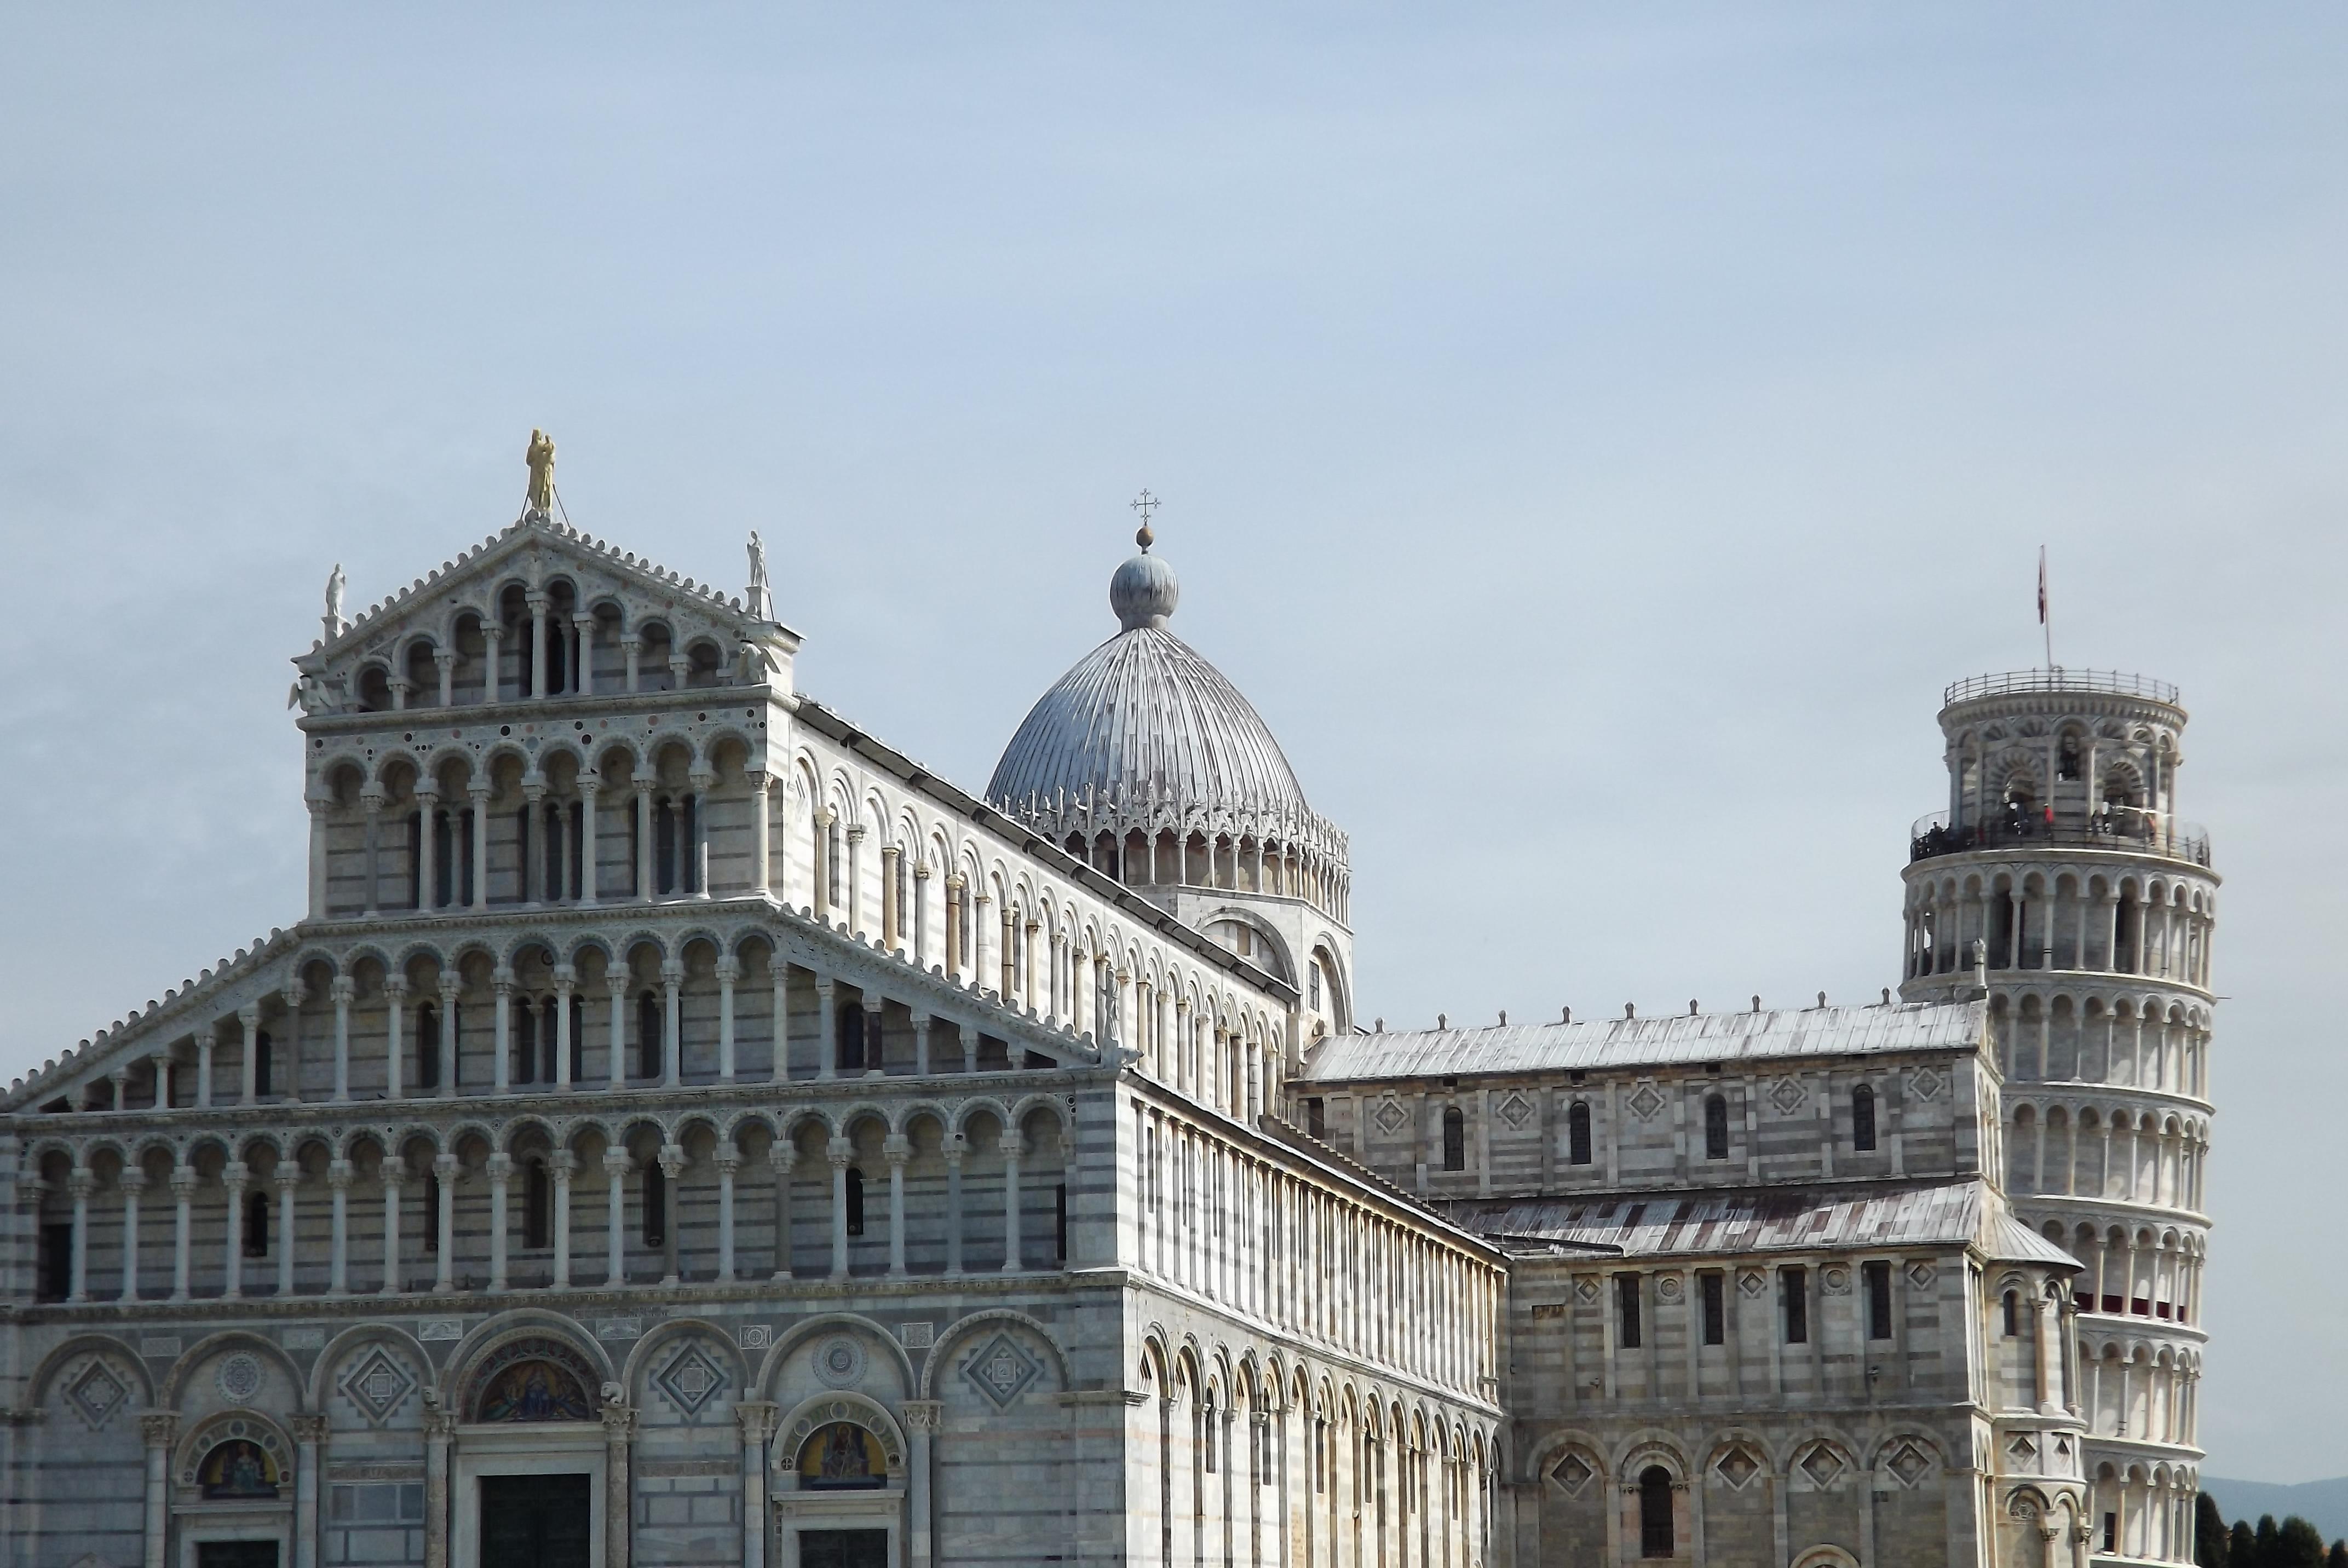 Piazza del Duomo, Pisa